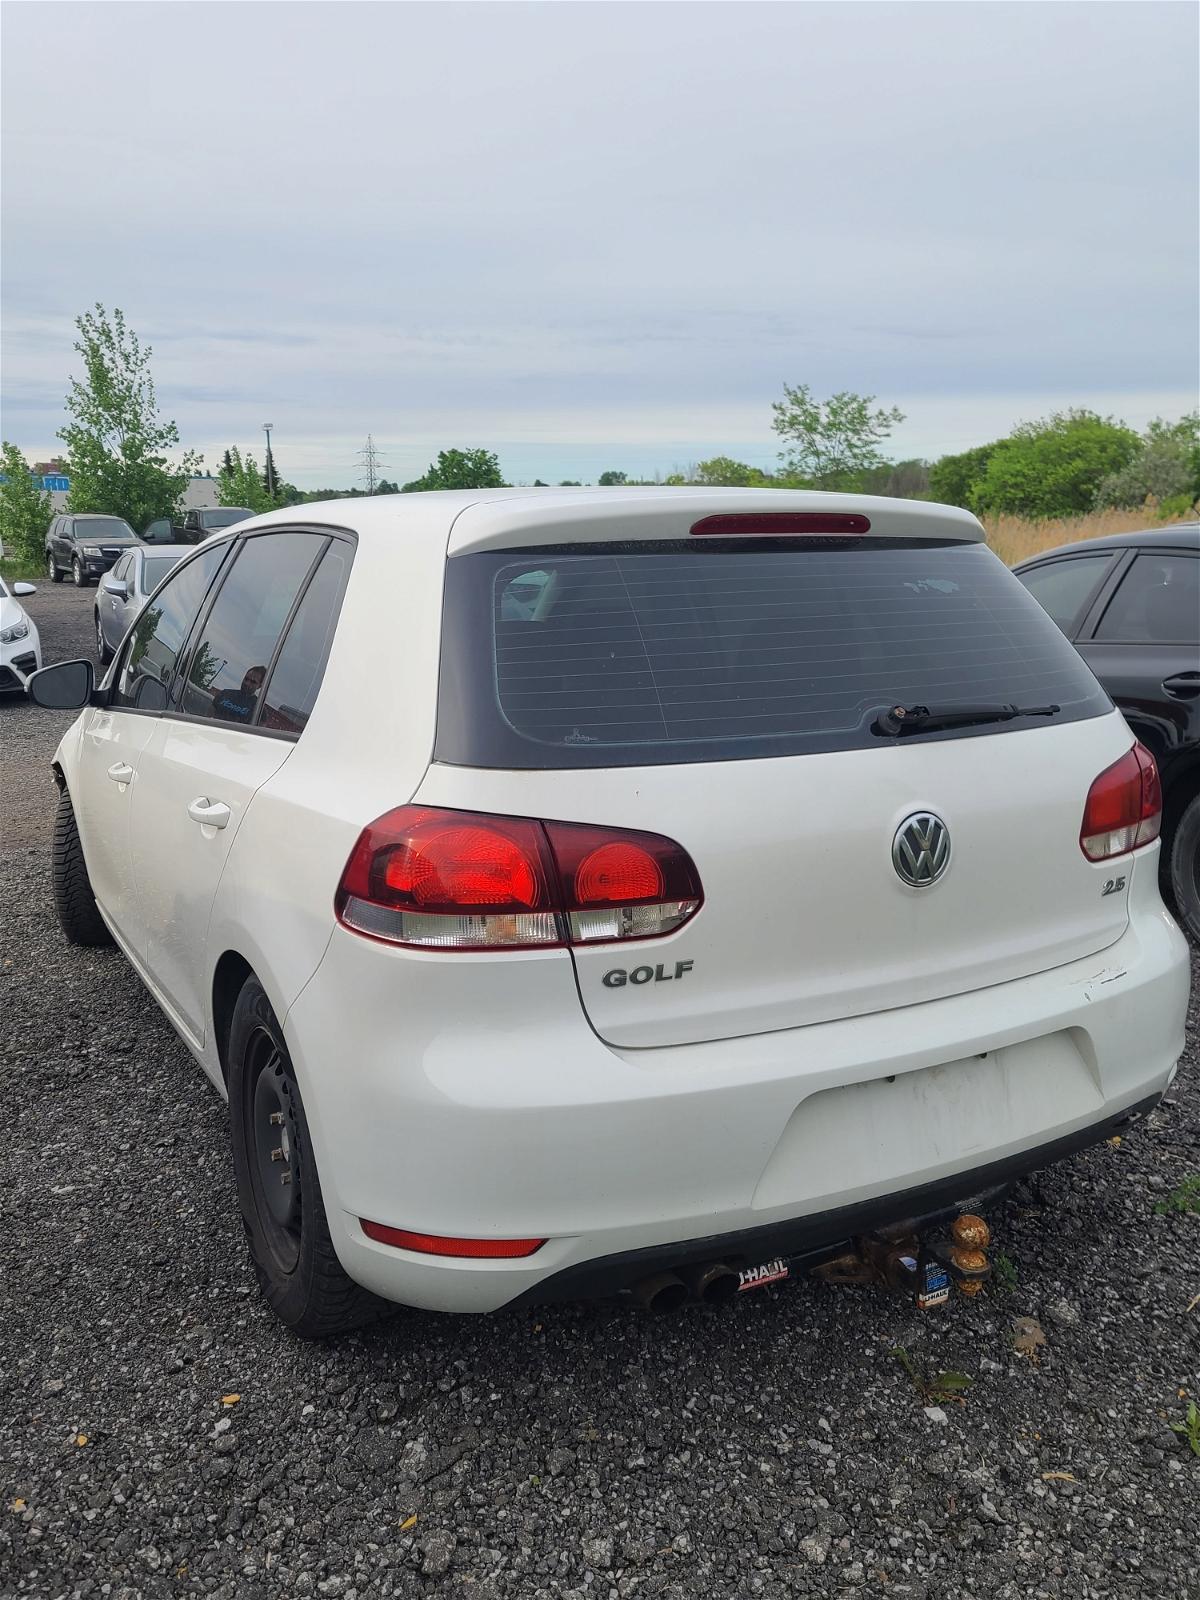 2013 - Volkswagen - Golf - WVWDA7AJ6DW060916